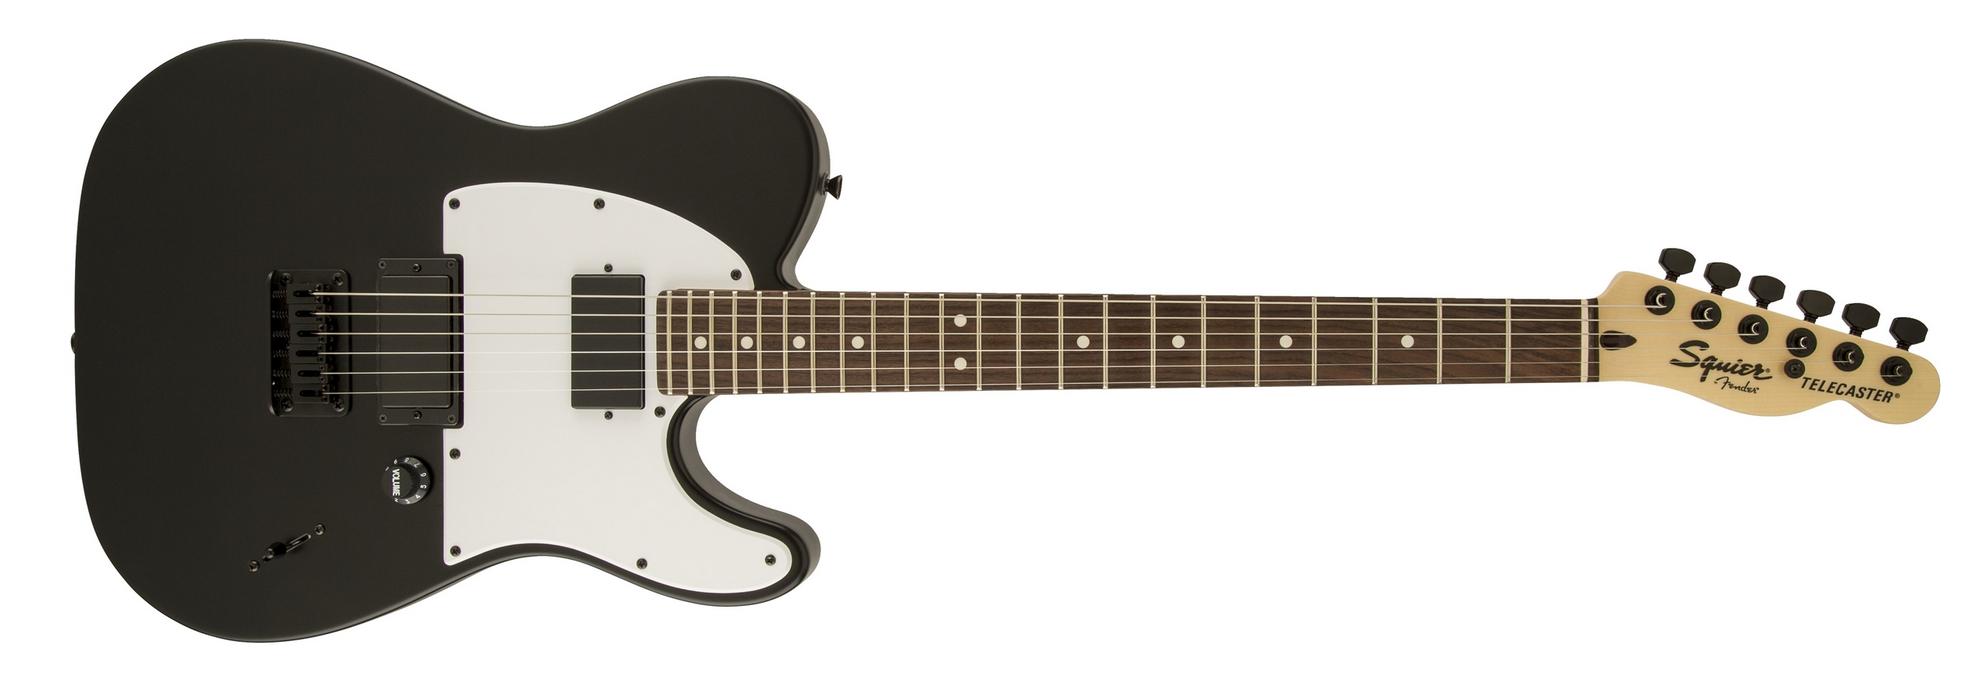 Fender Squier Jim Root Telecaster